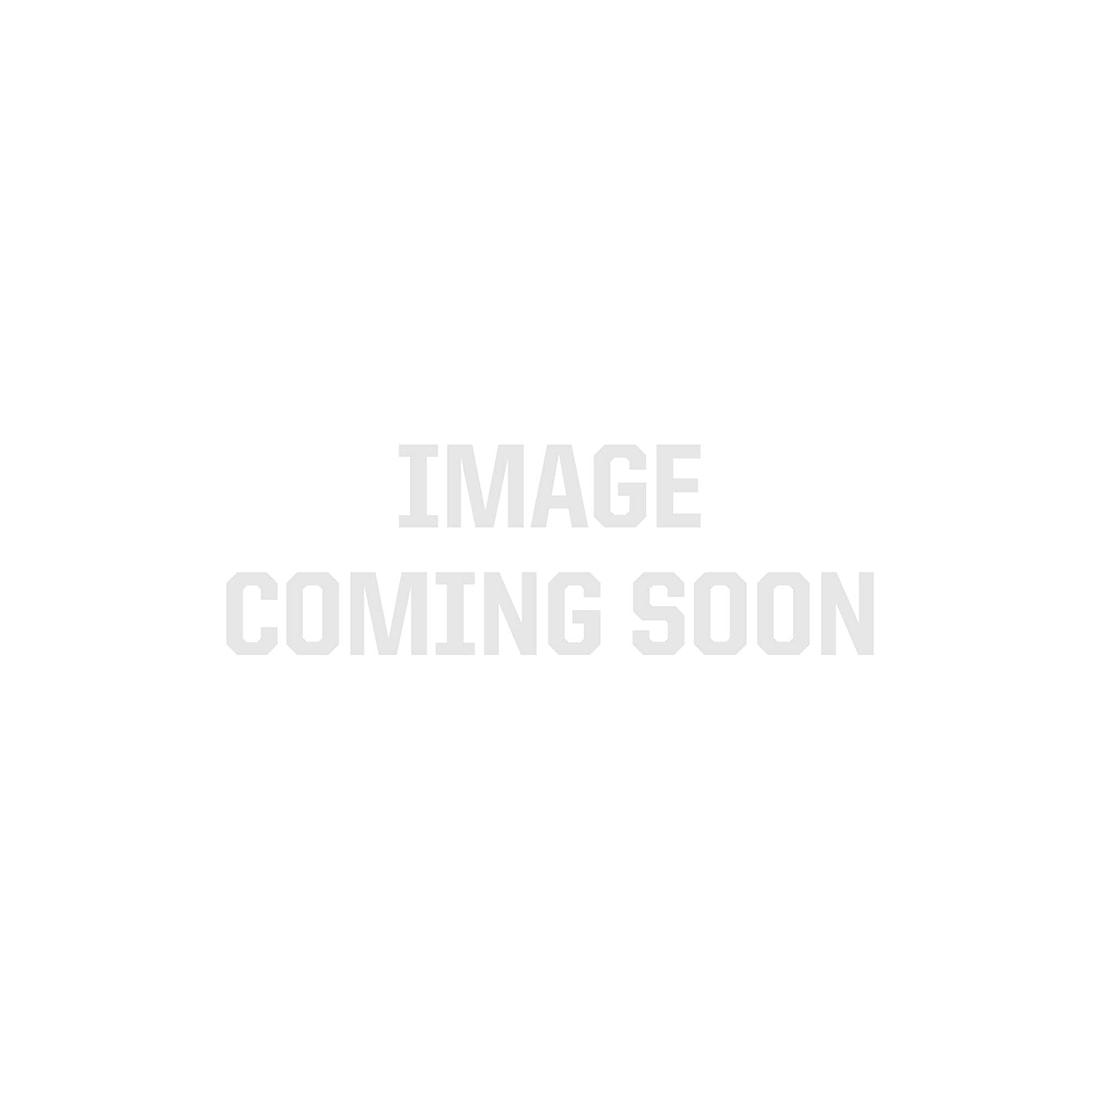 Leviton 6674 Sureslide CFL/LED Dimmer; 150 Watt, Single Pole or 3-Way (Multi-location) White